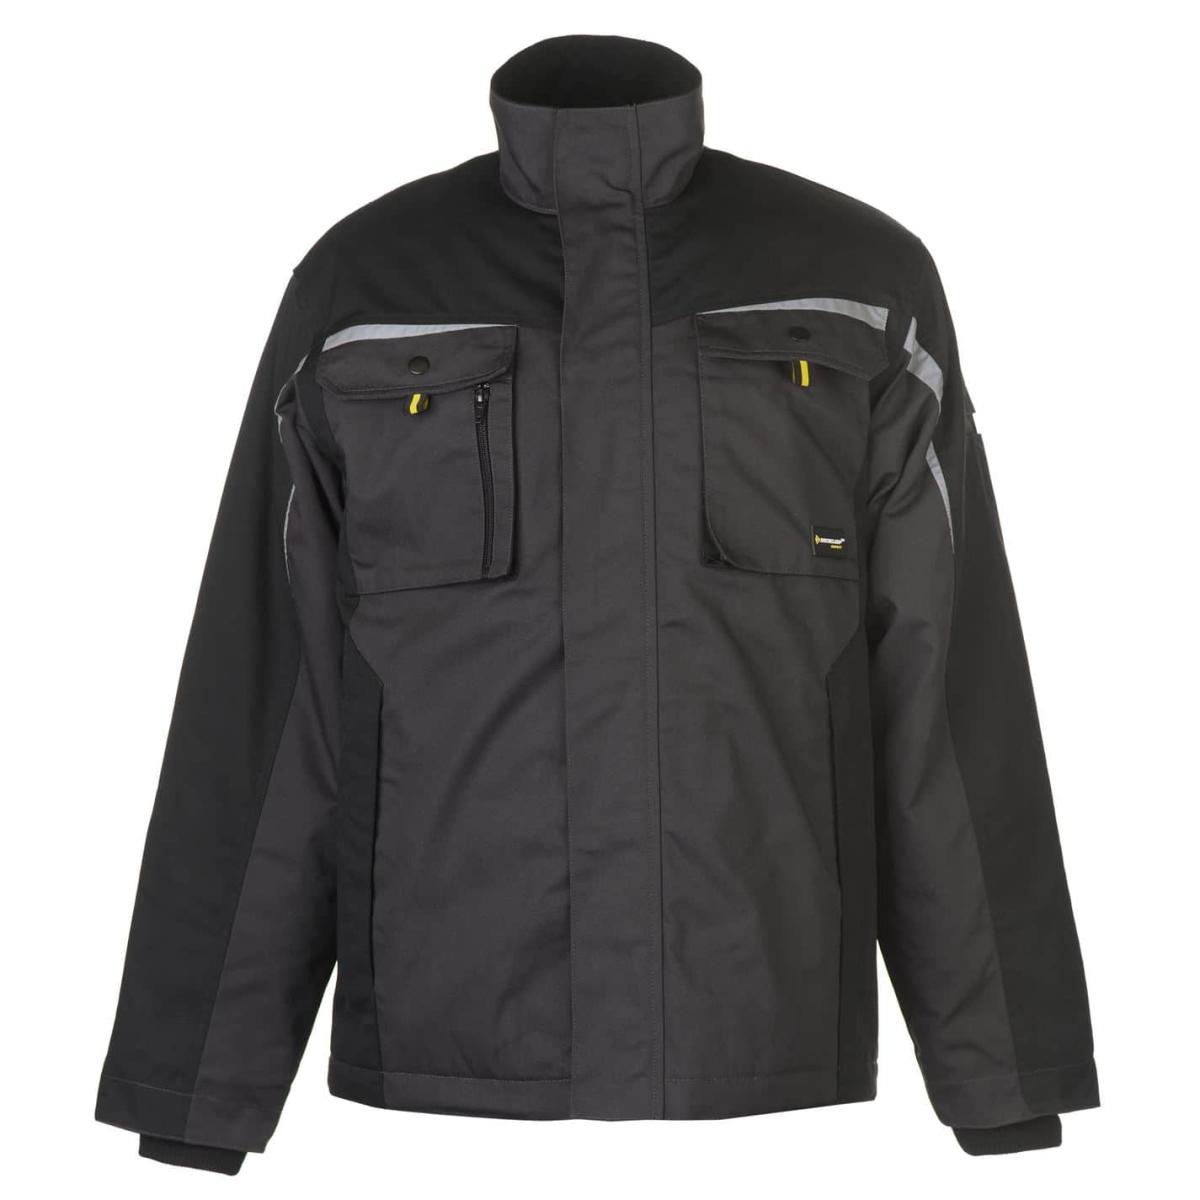 Dunlop Craft Warm Winterjacke Jacke Herren Schwarz_Dunkelgrau